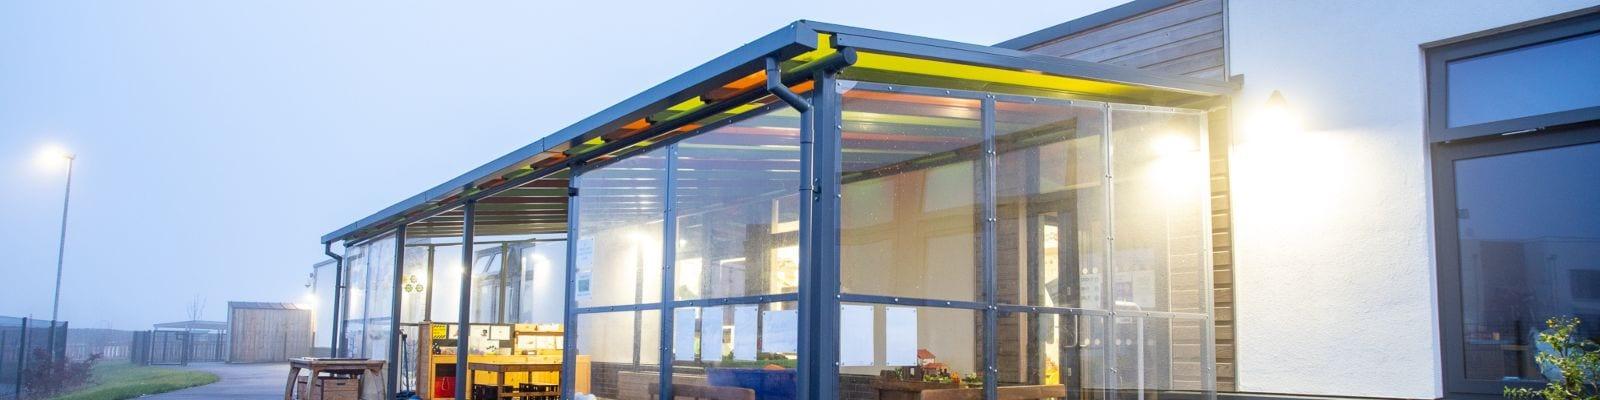 Outdoor shelter we installed at Monksmoor Park Primary School